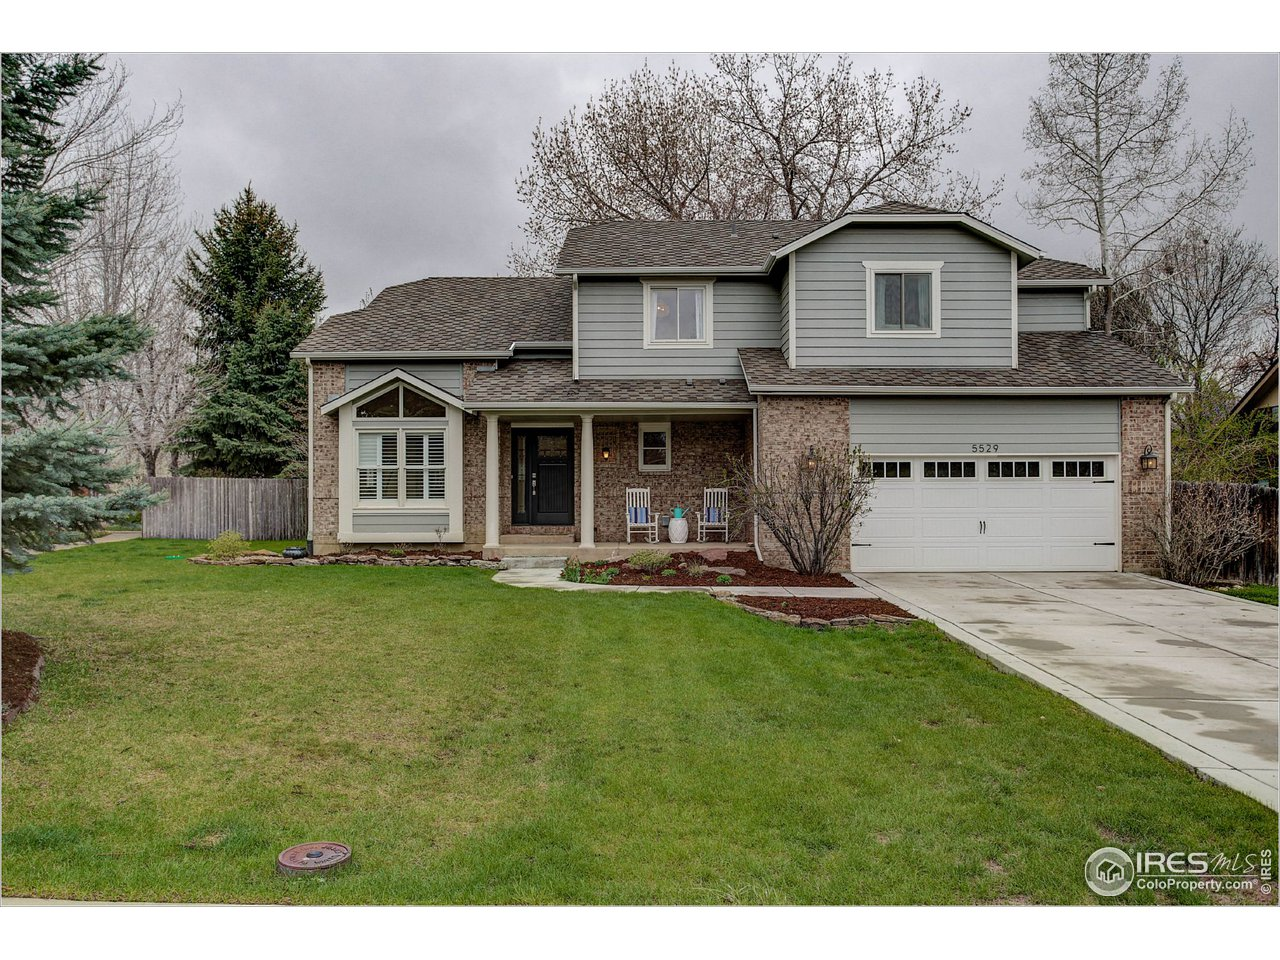 5529 Ptarmigan Cir, Boulder CO 80301